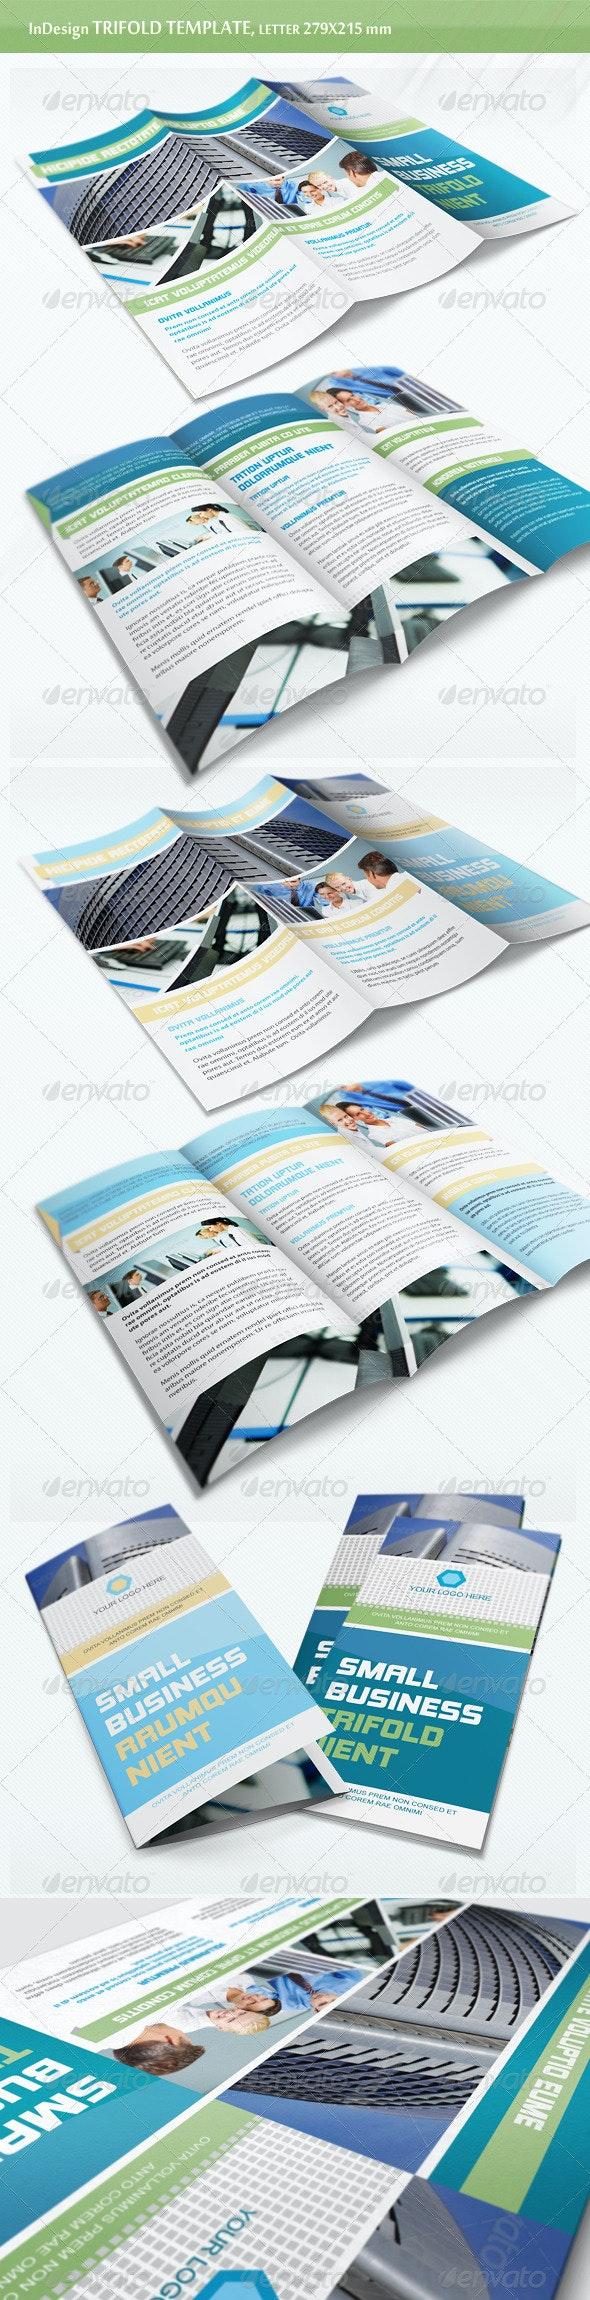 Business Trifold Brochure - v6 - Corporate Brochures